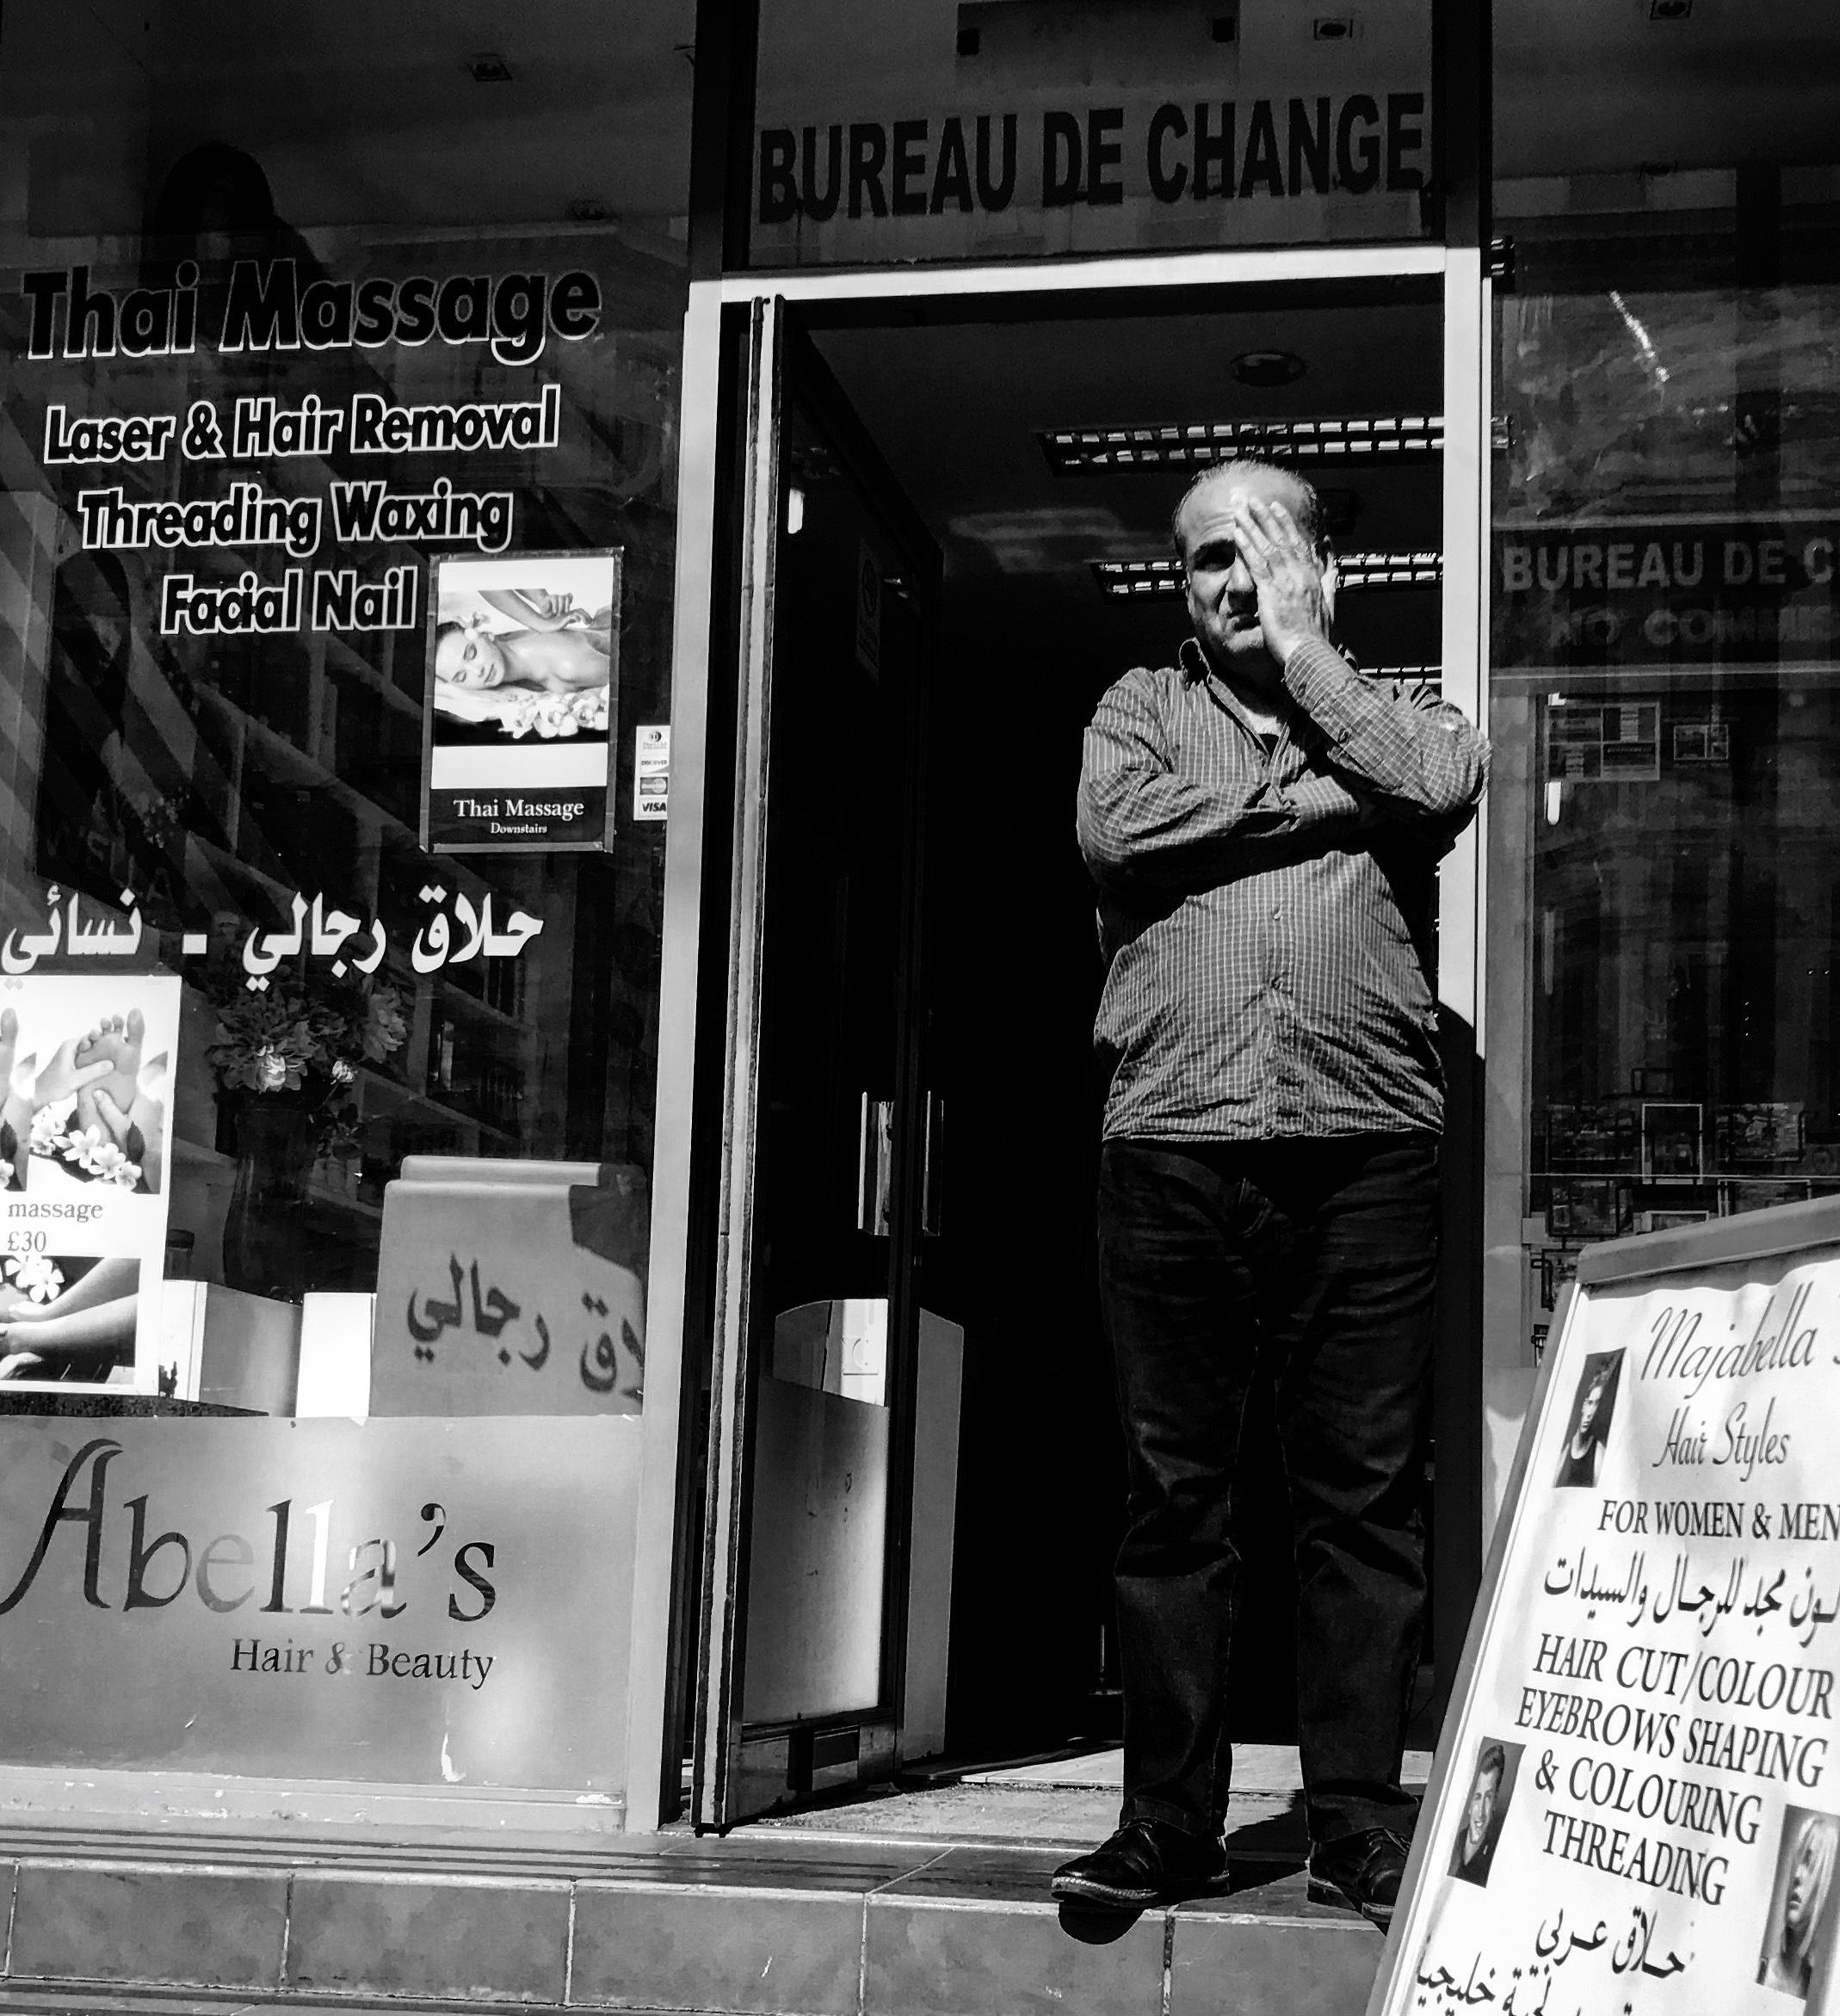 Thai_Massage_Old_Man_Hand_London.jpg